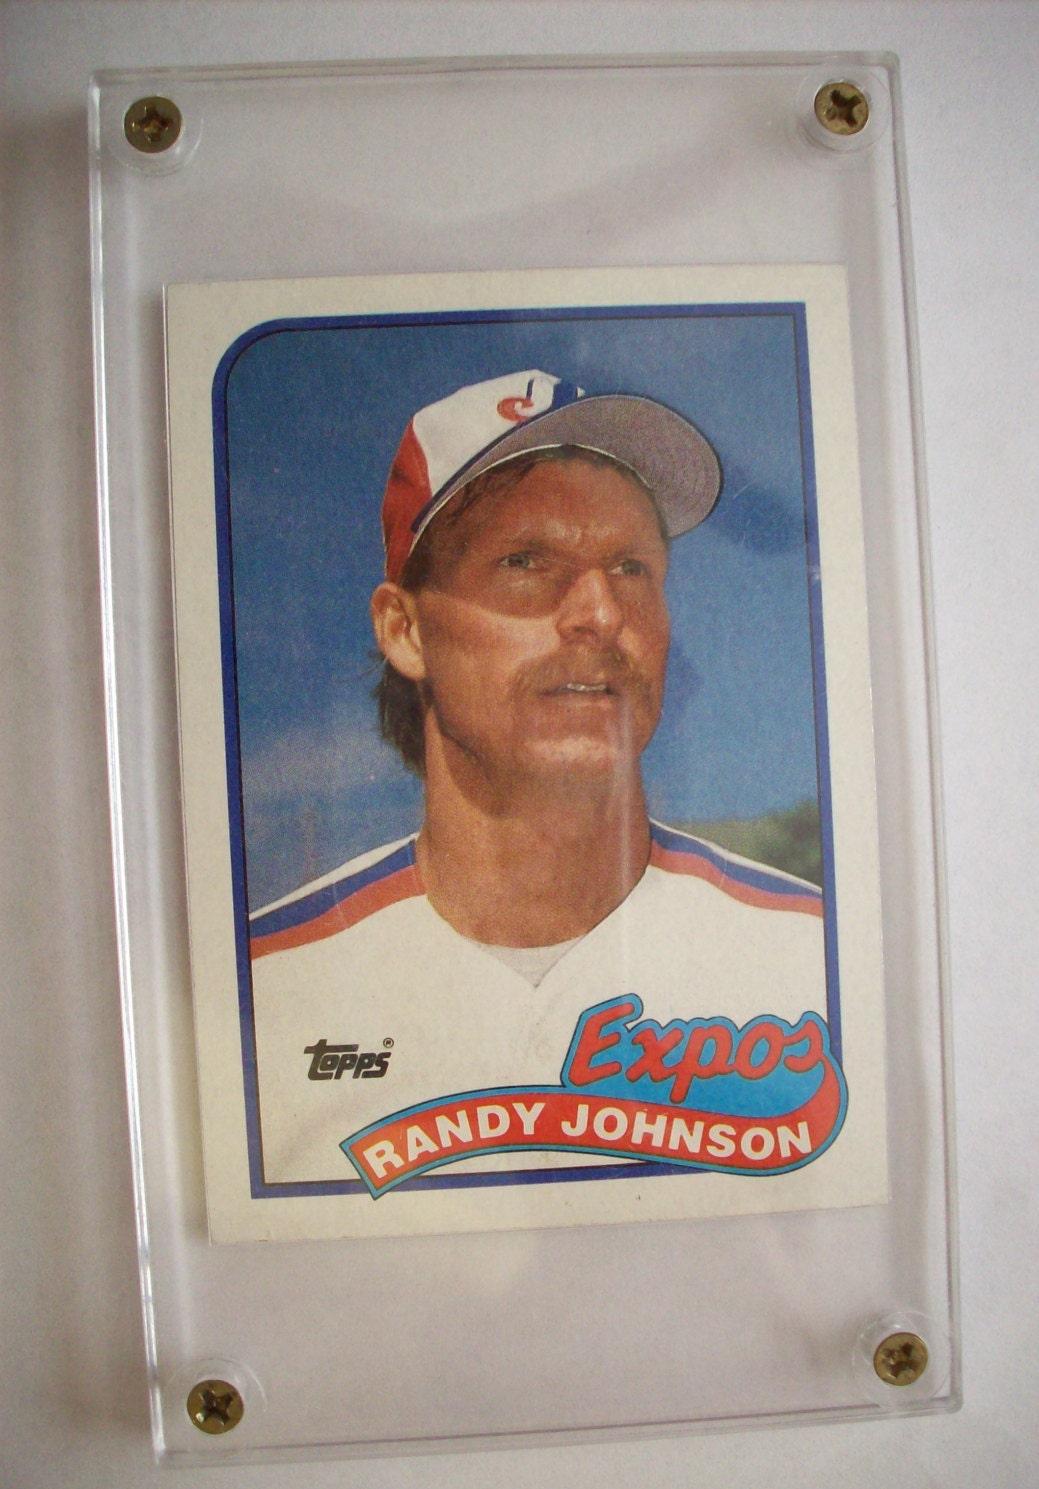 Randy Johnson Encased 1989 Topps Rookie Card Card 647 Not Graded Expos Pitcher Nice Condition Baseball Card Baseball Memorabilia